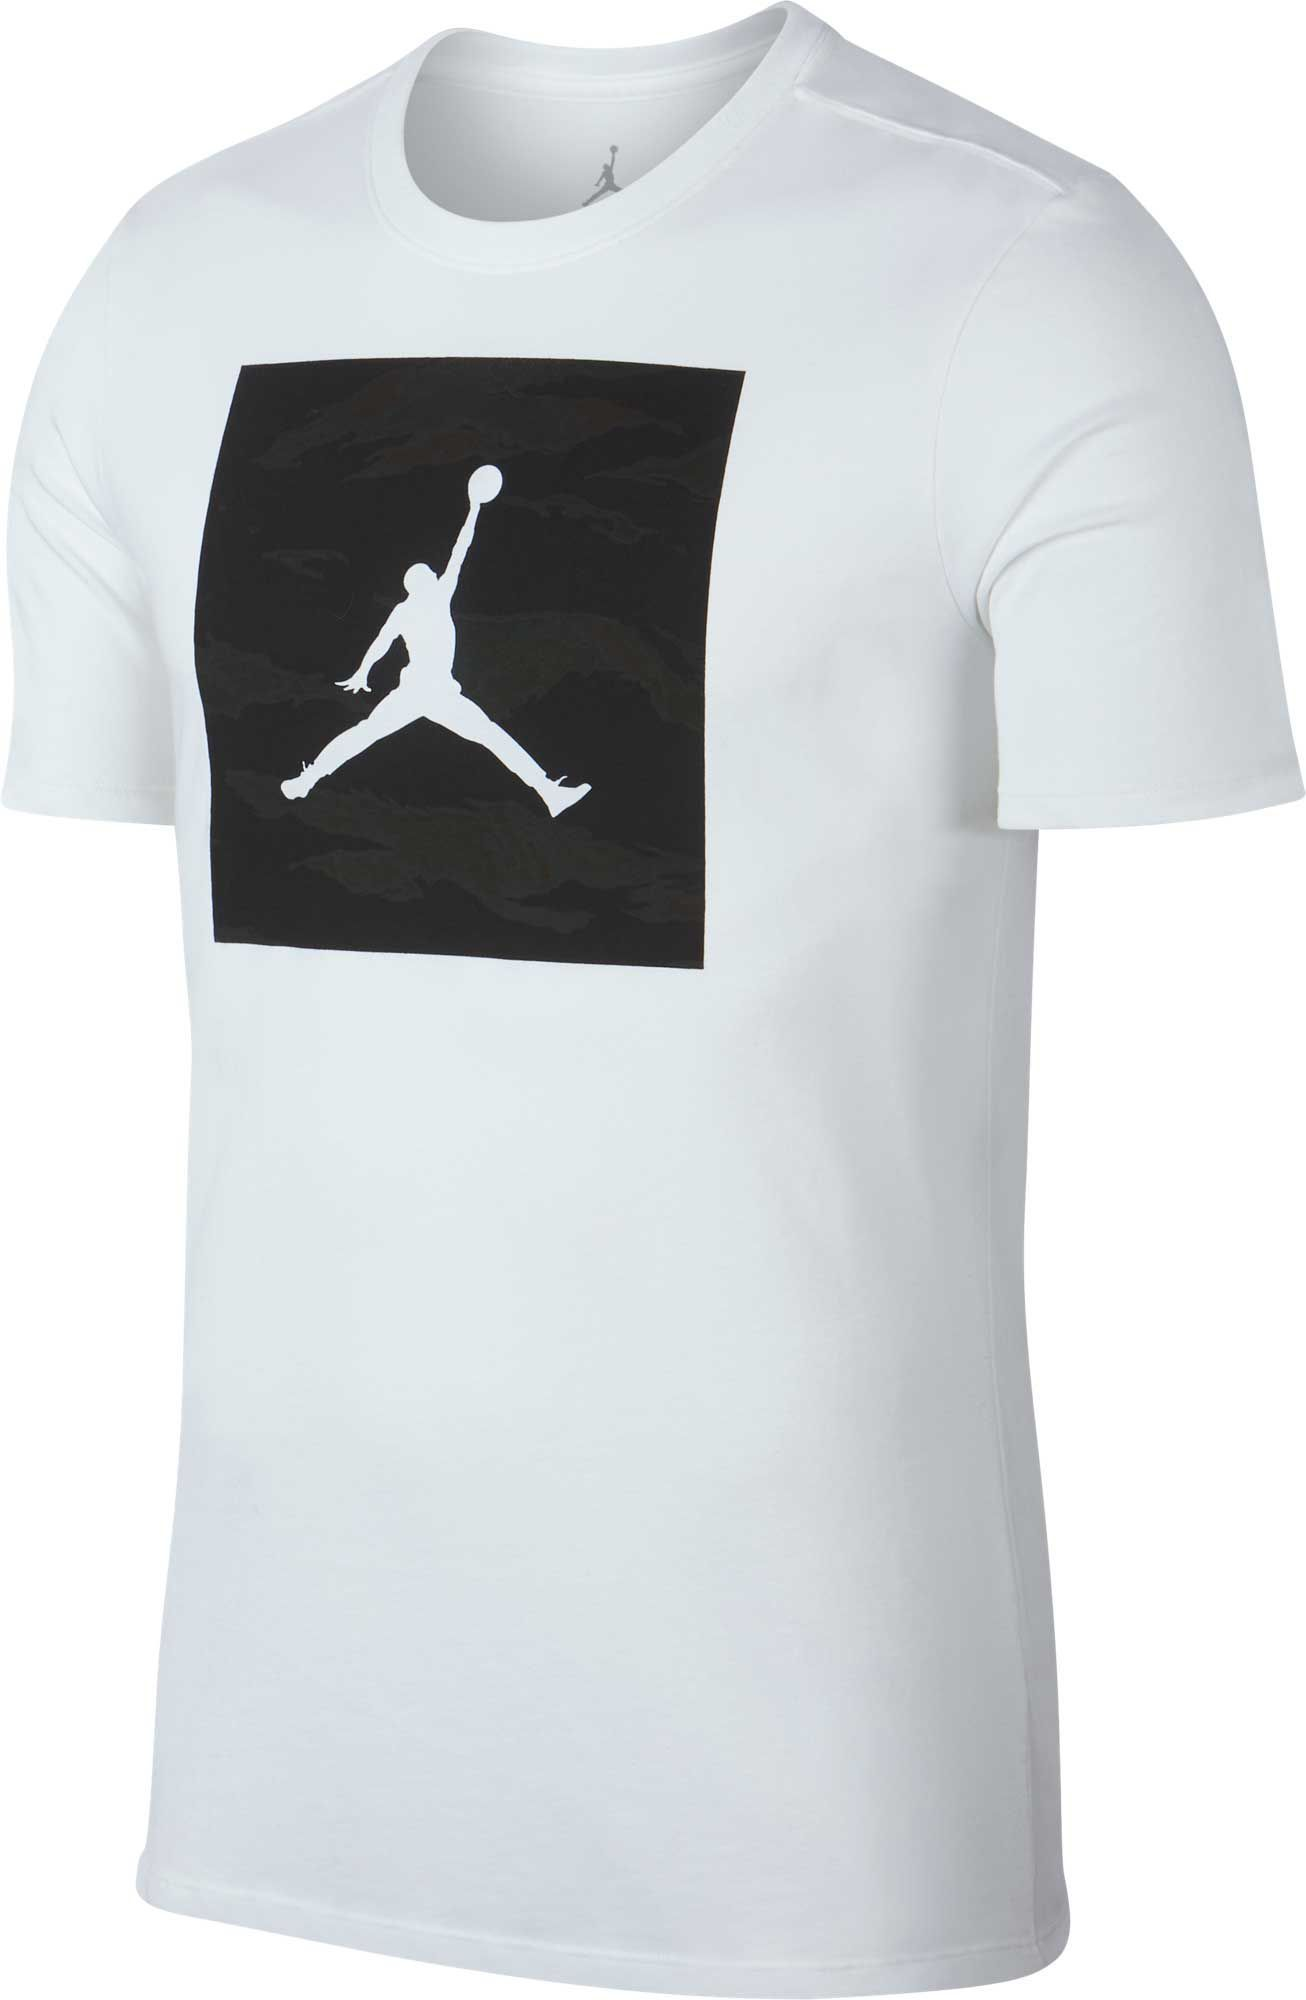 free shipping 865b5 6a5f8 Jordan Men s Iconic 23 7 Graphic T-Shirt, White